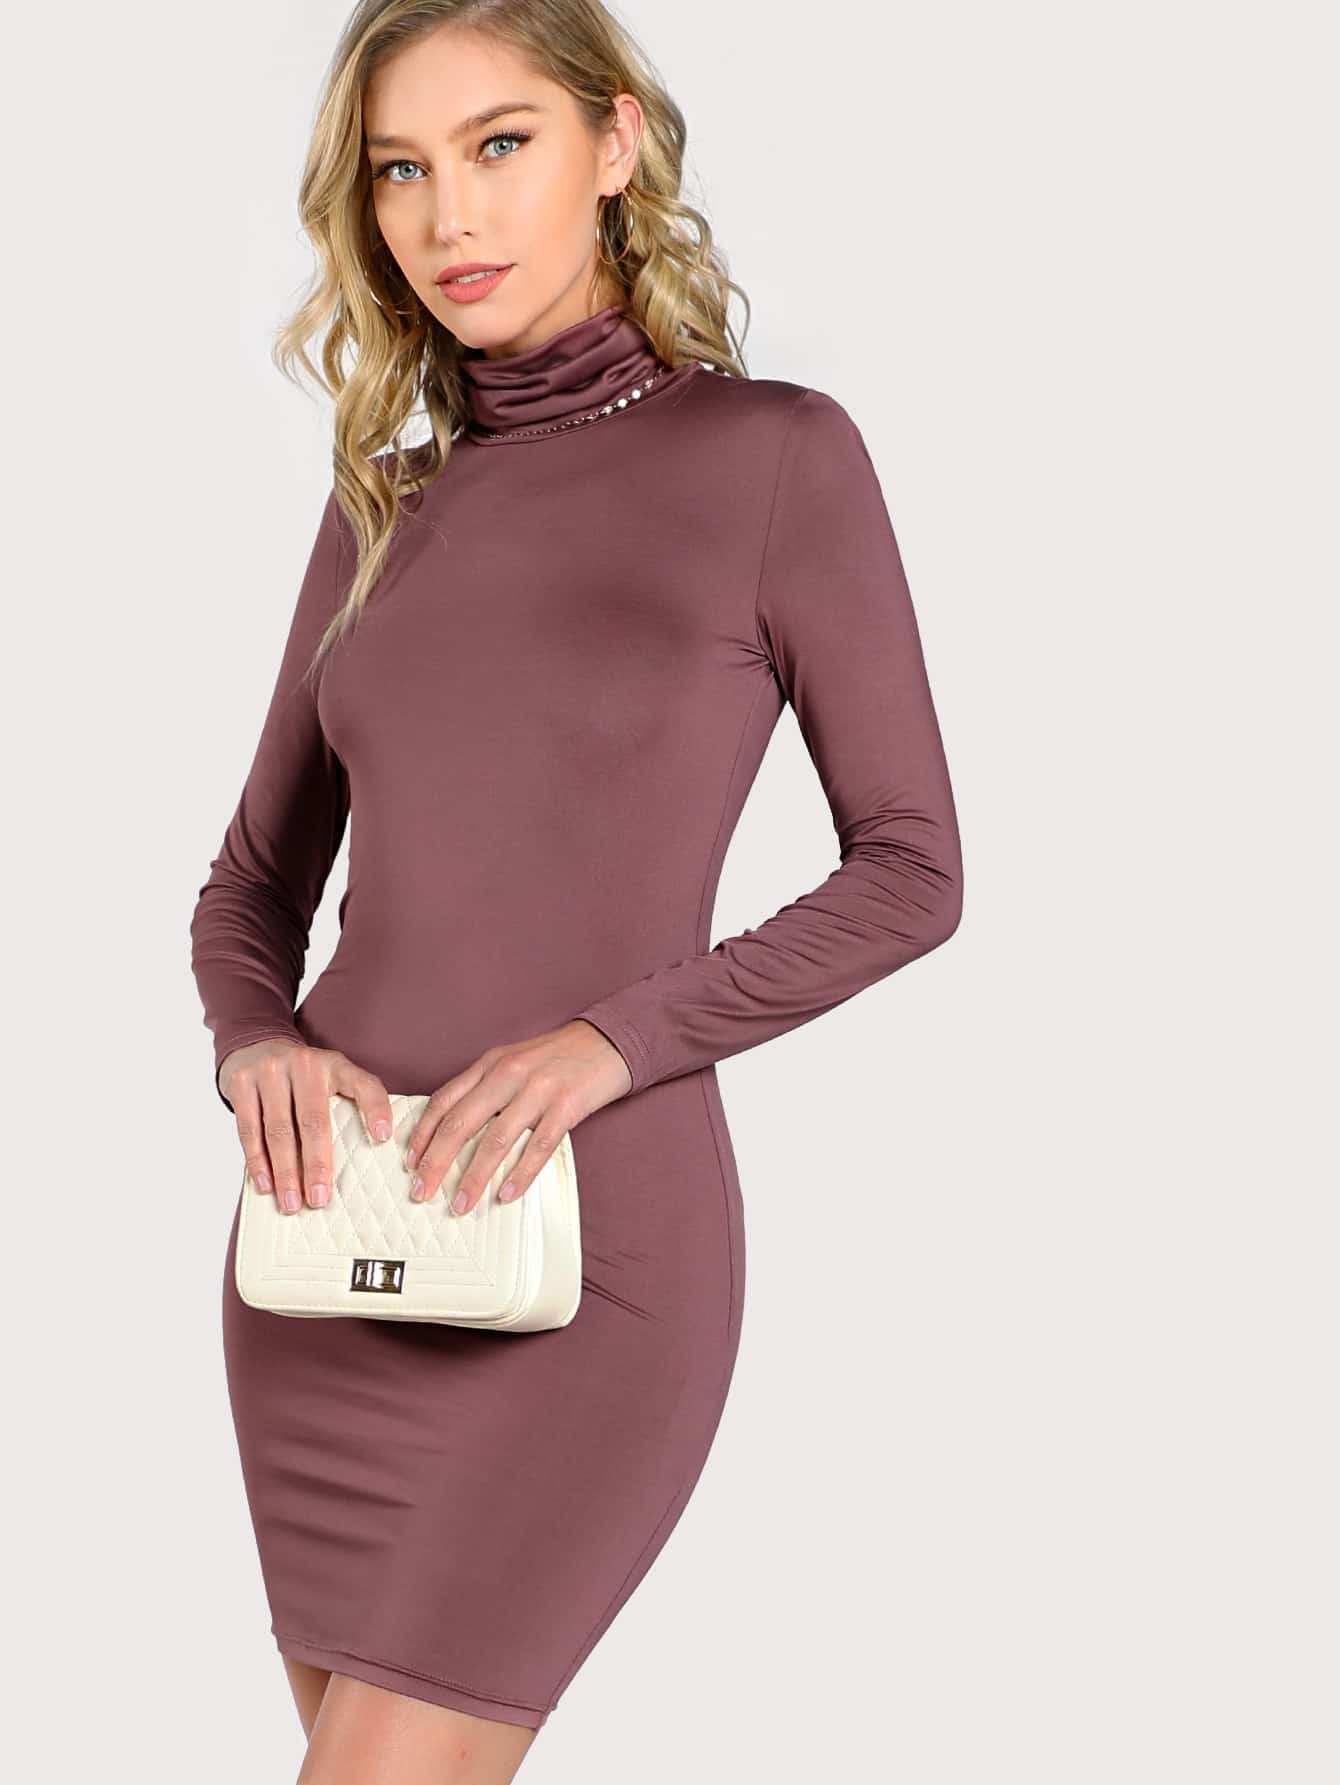 High Neck Form Fitting Dress metallic form fitting dress